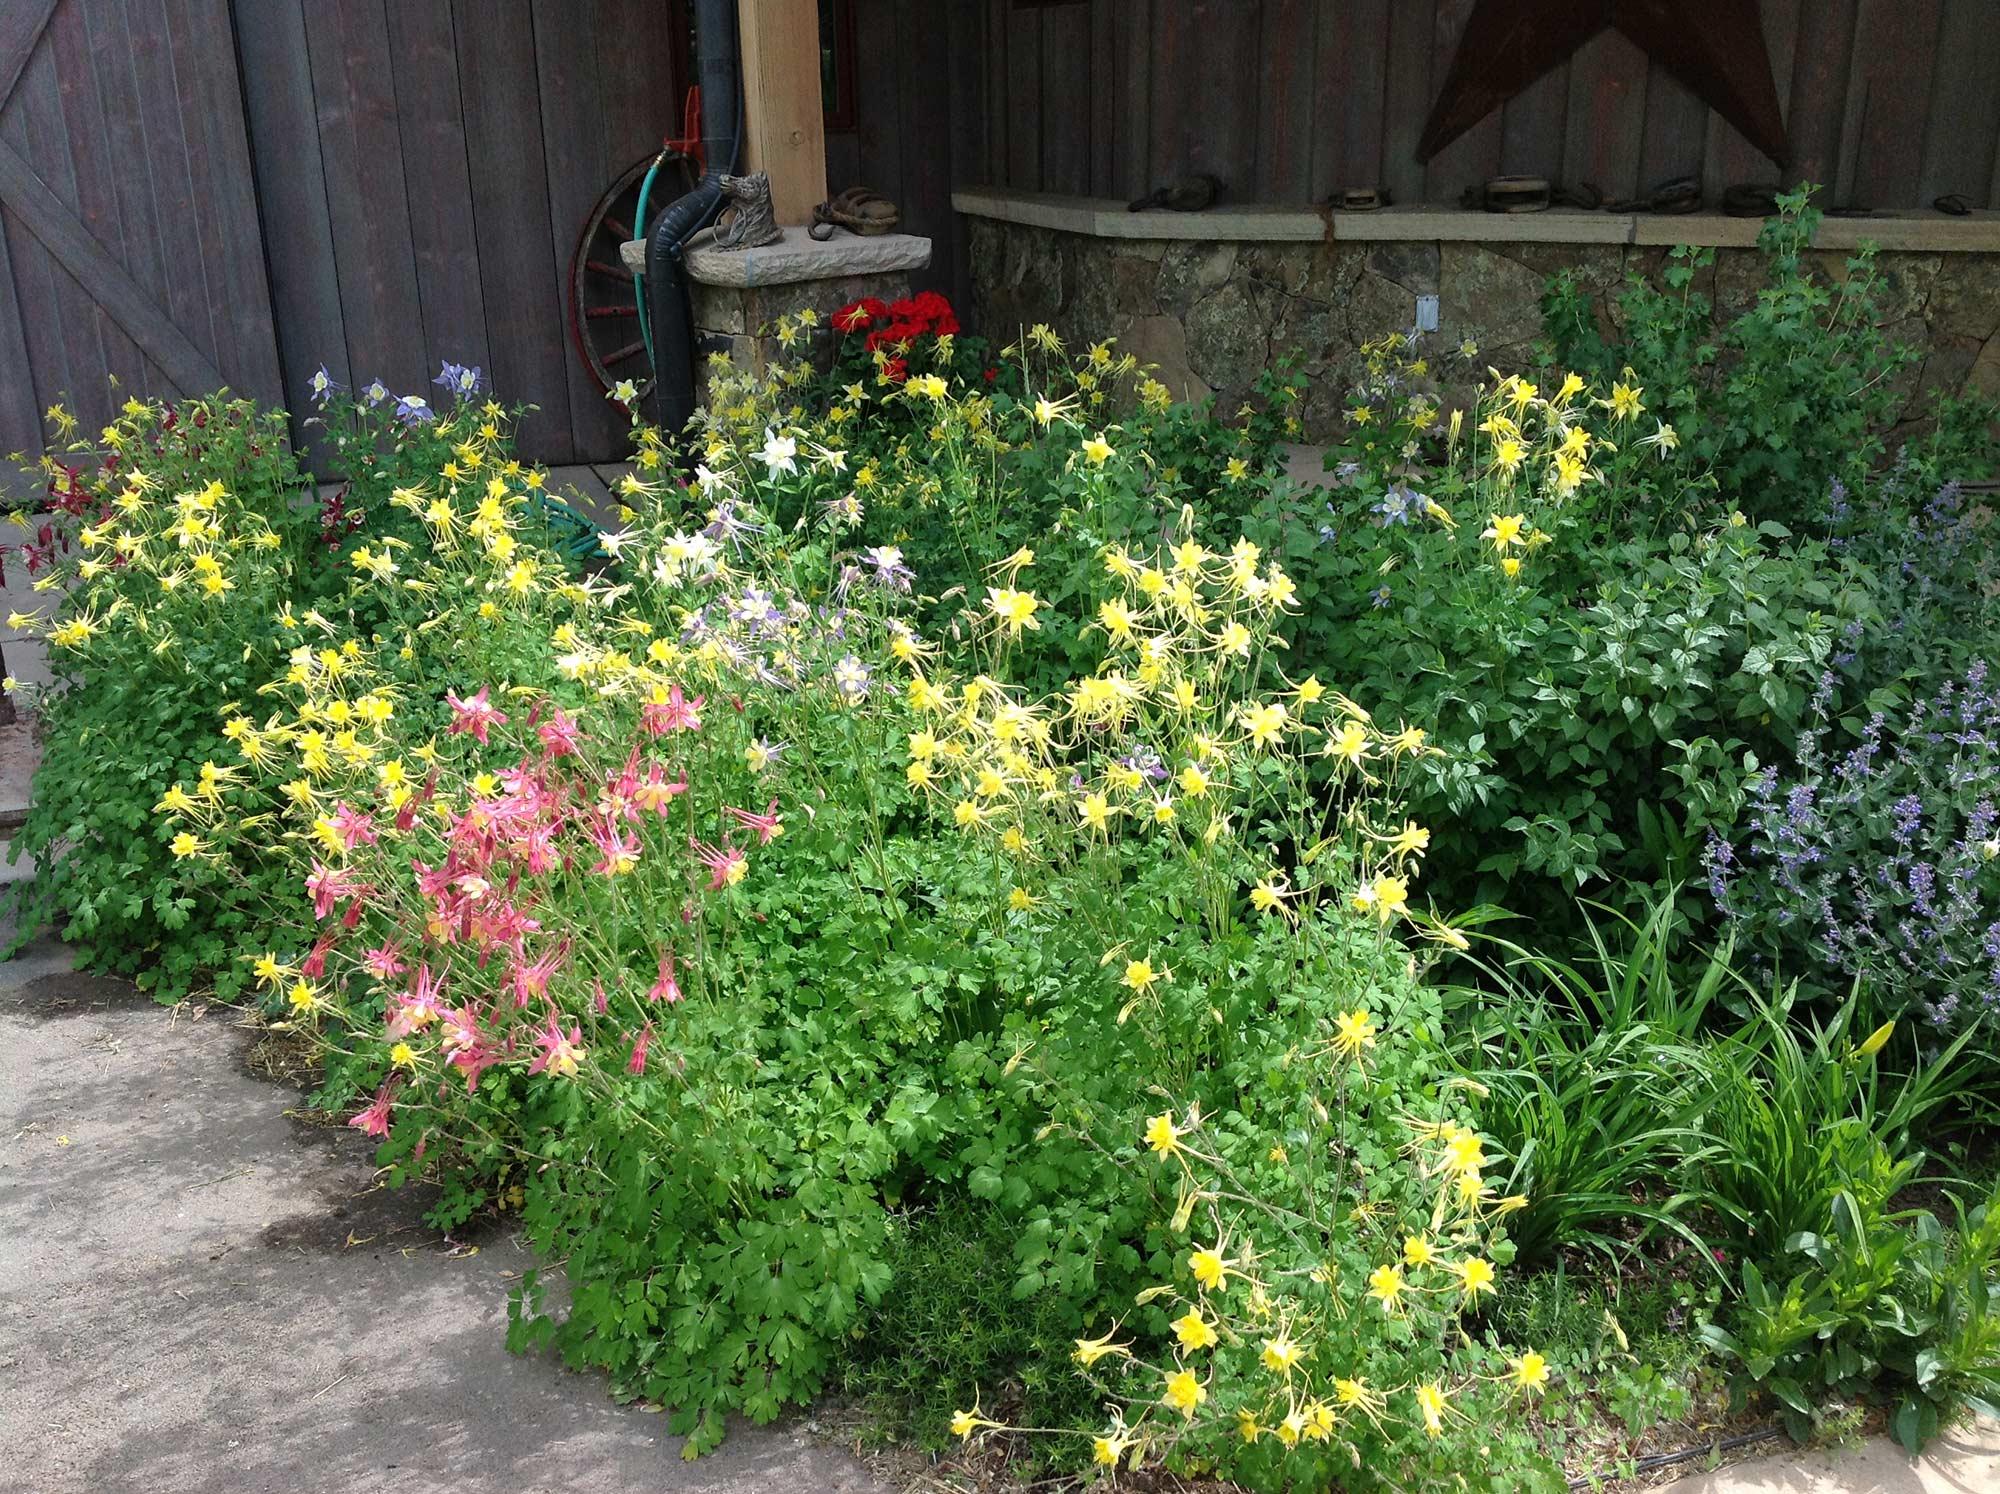 bigstock-Garden-Irrigation-System-38458408.jpg